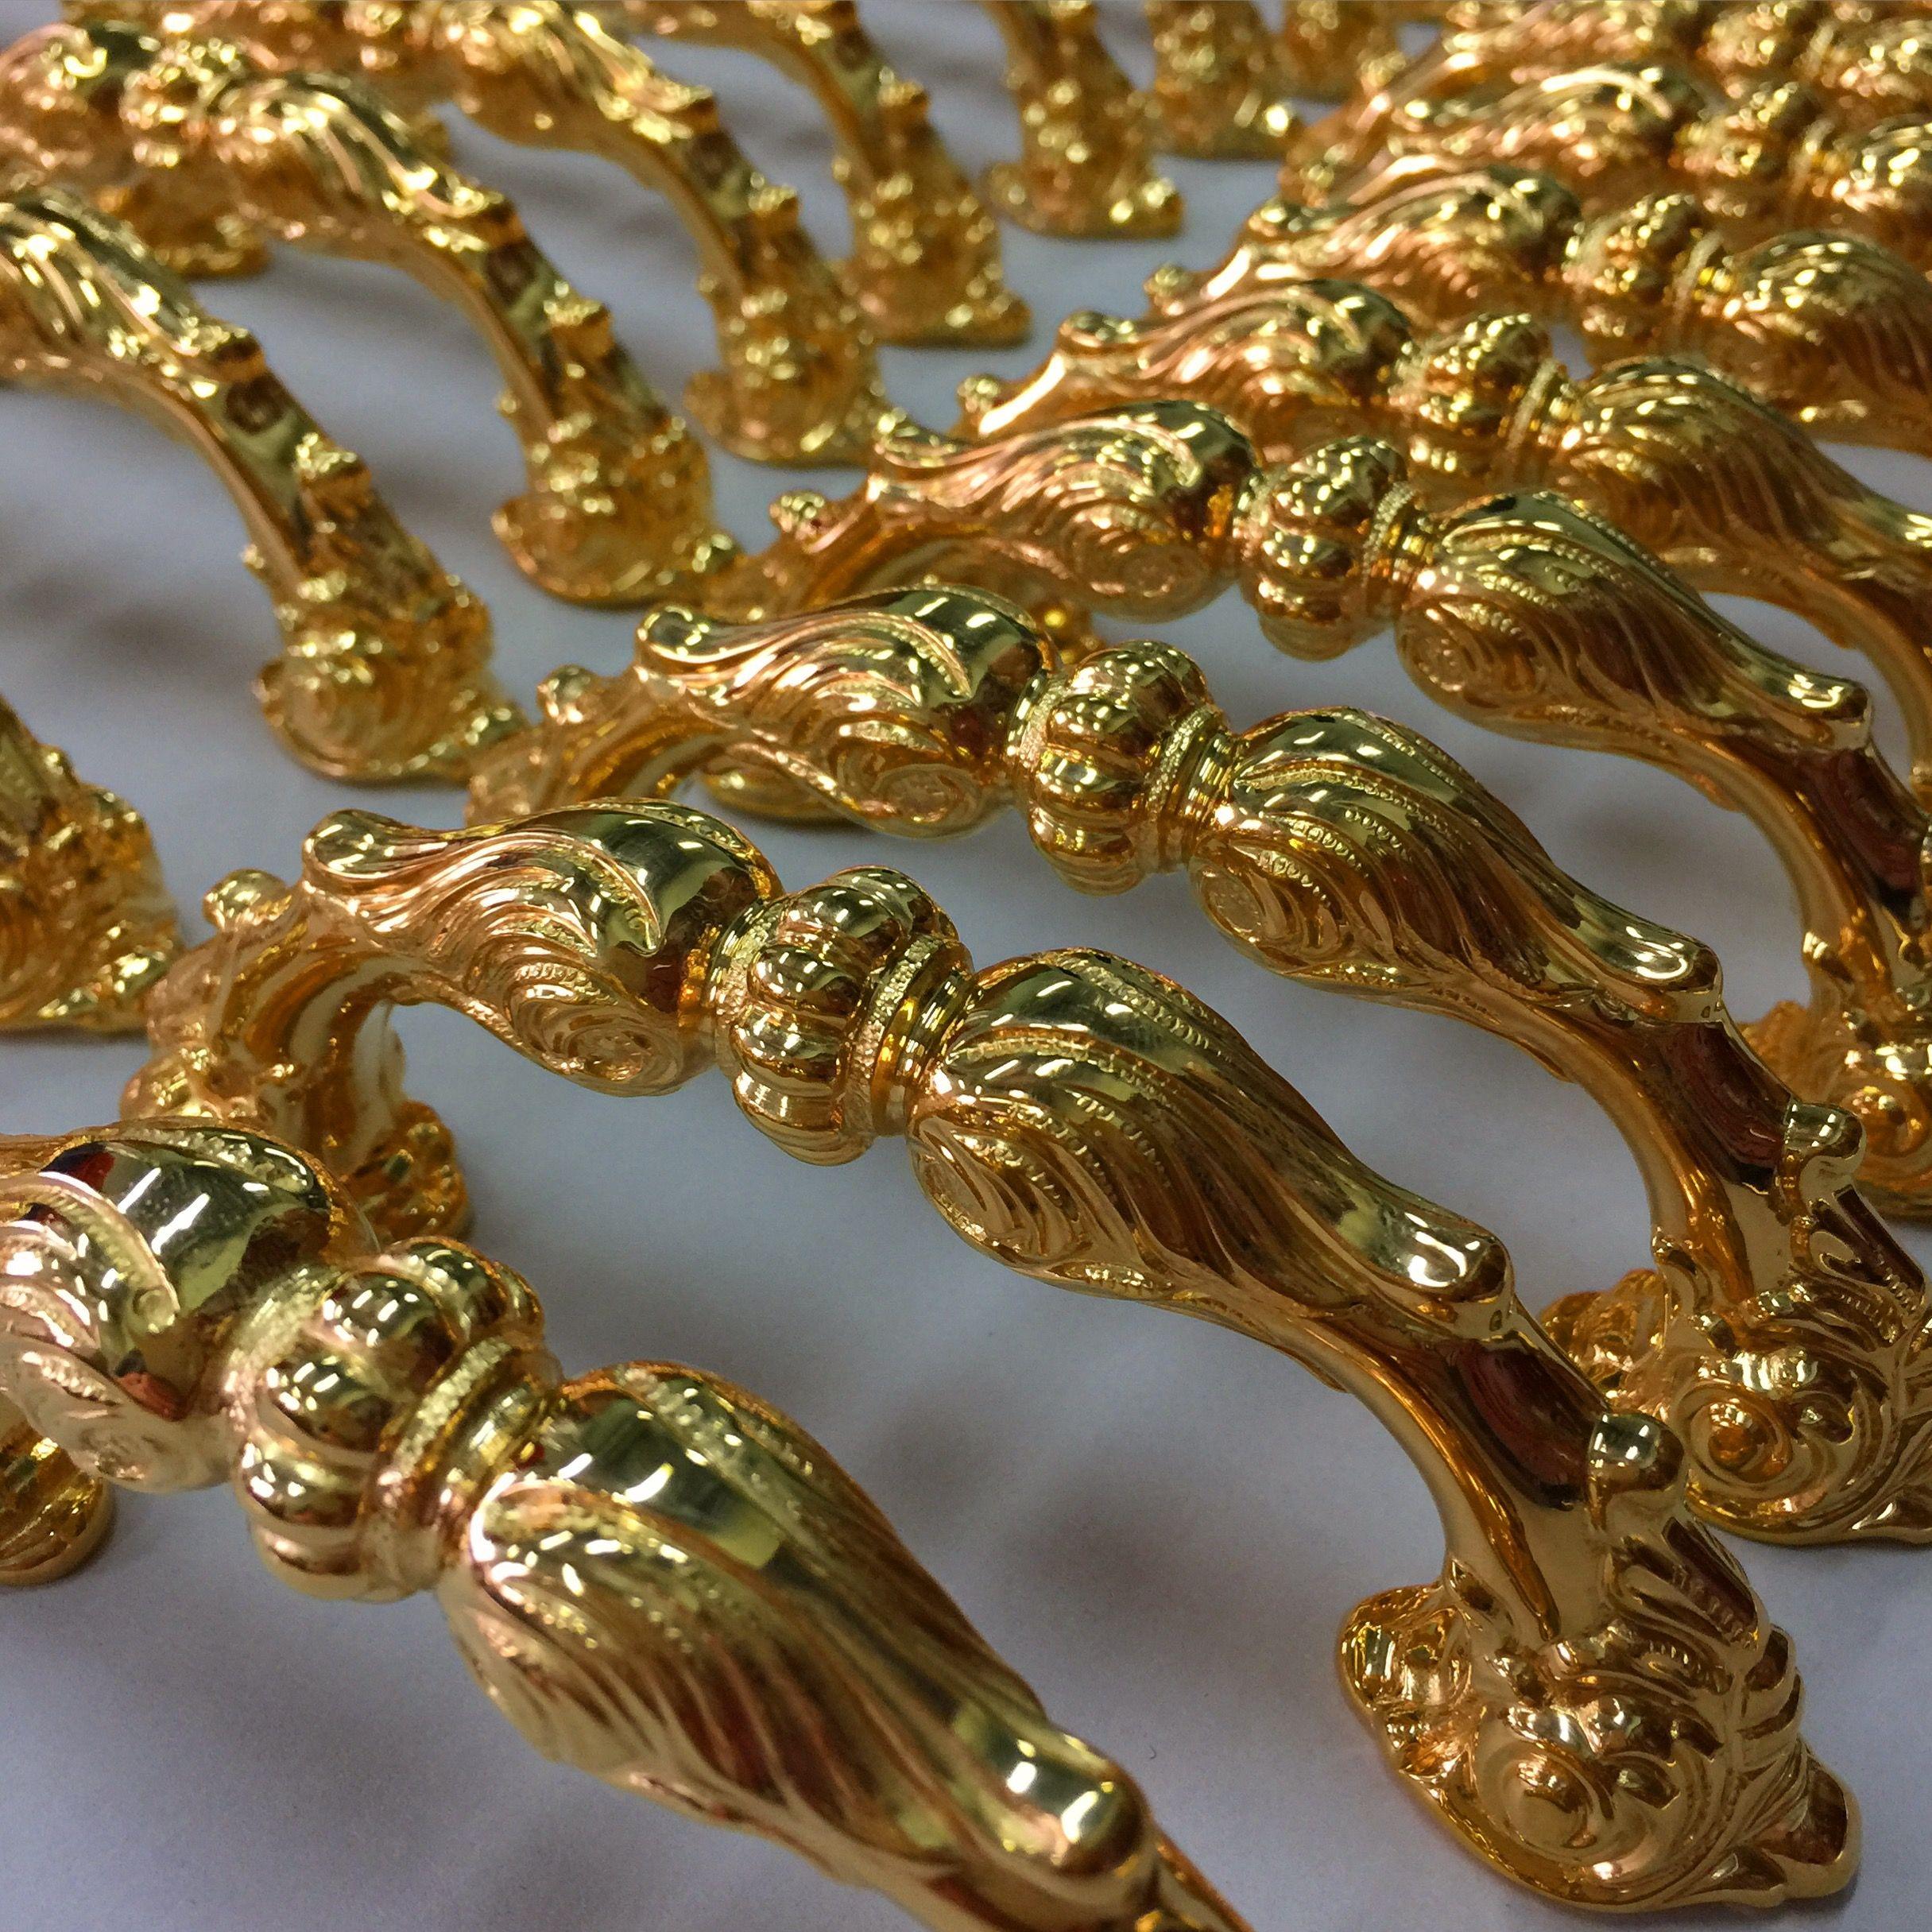 Gold Plated Custom Cabinet Pulls Www.balticacustomhardware.com